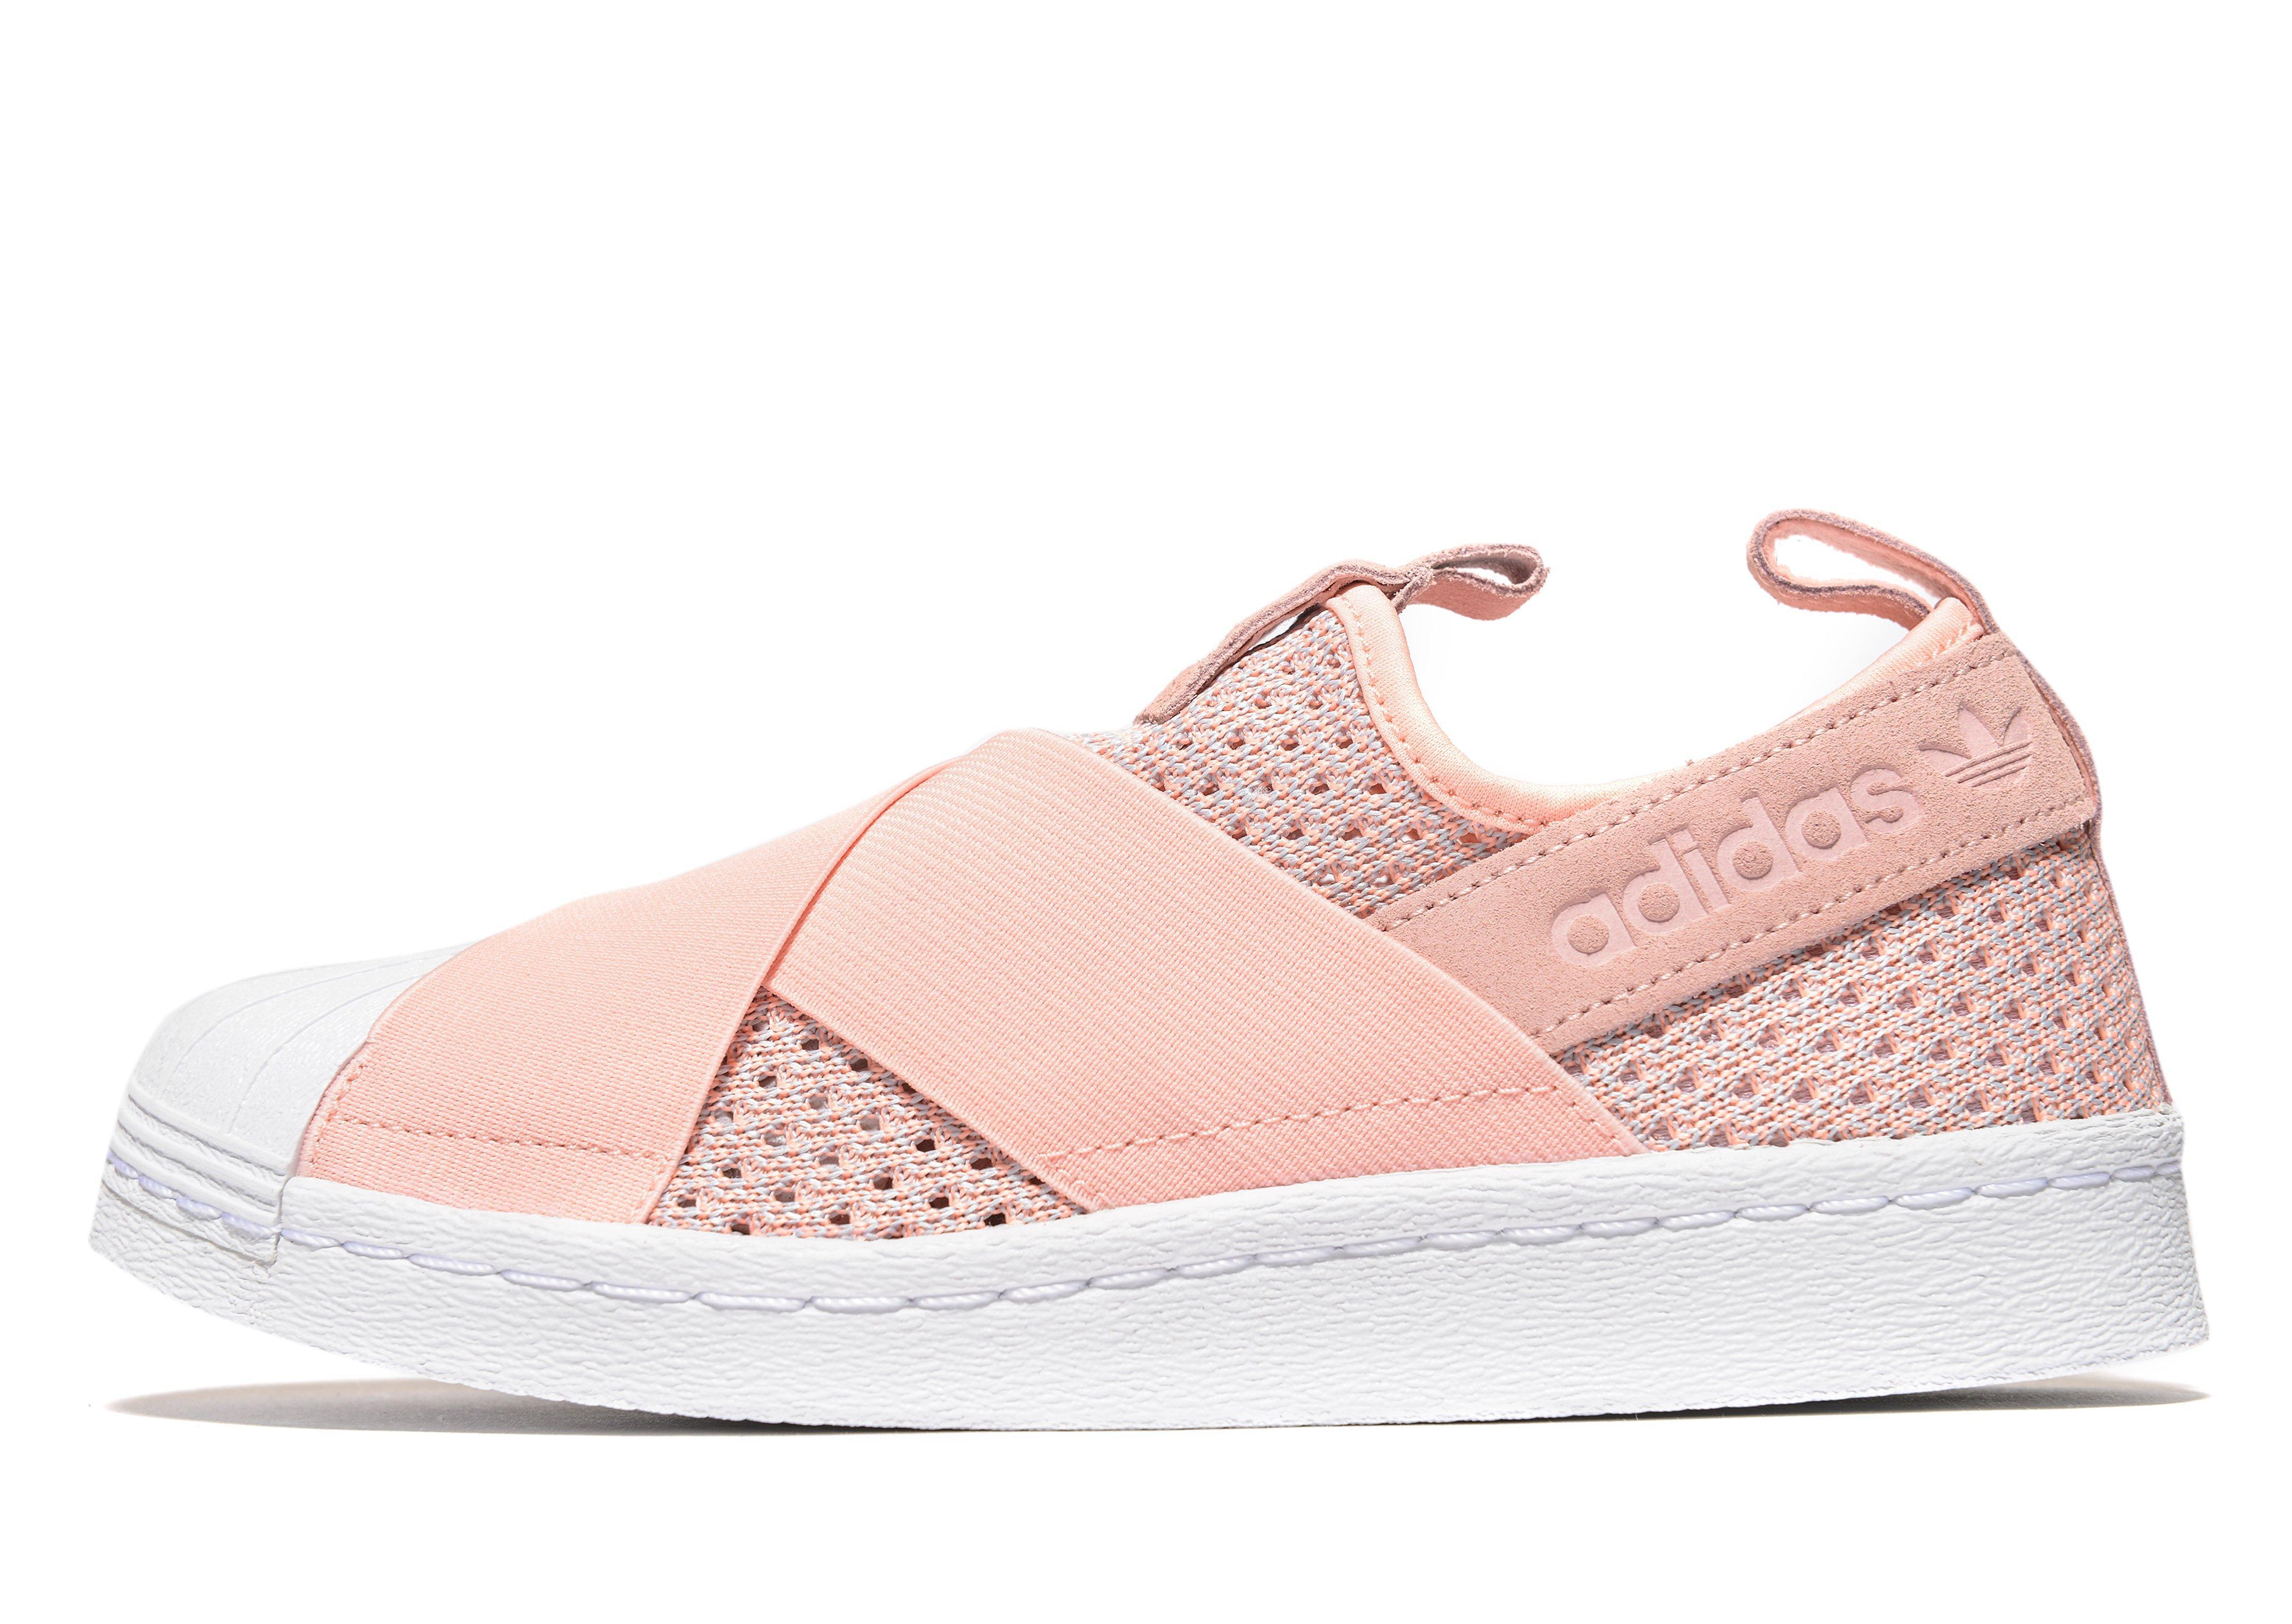 adidas superstar pink slip on